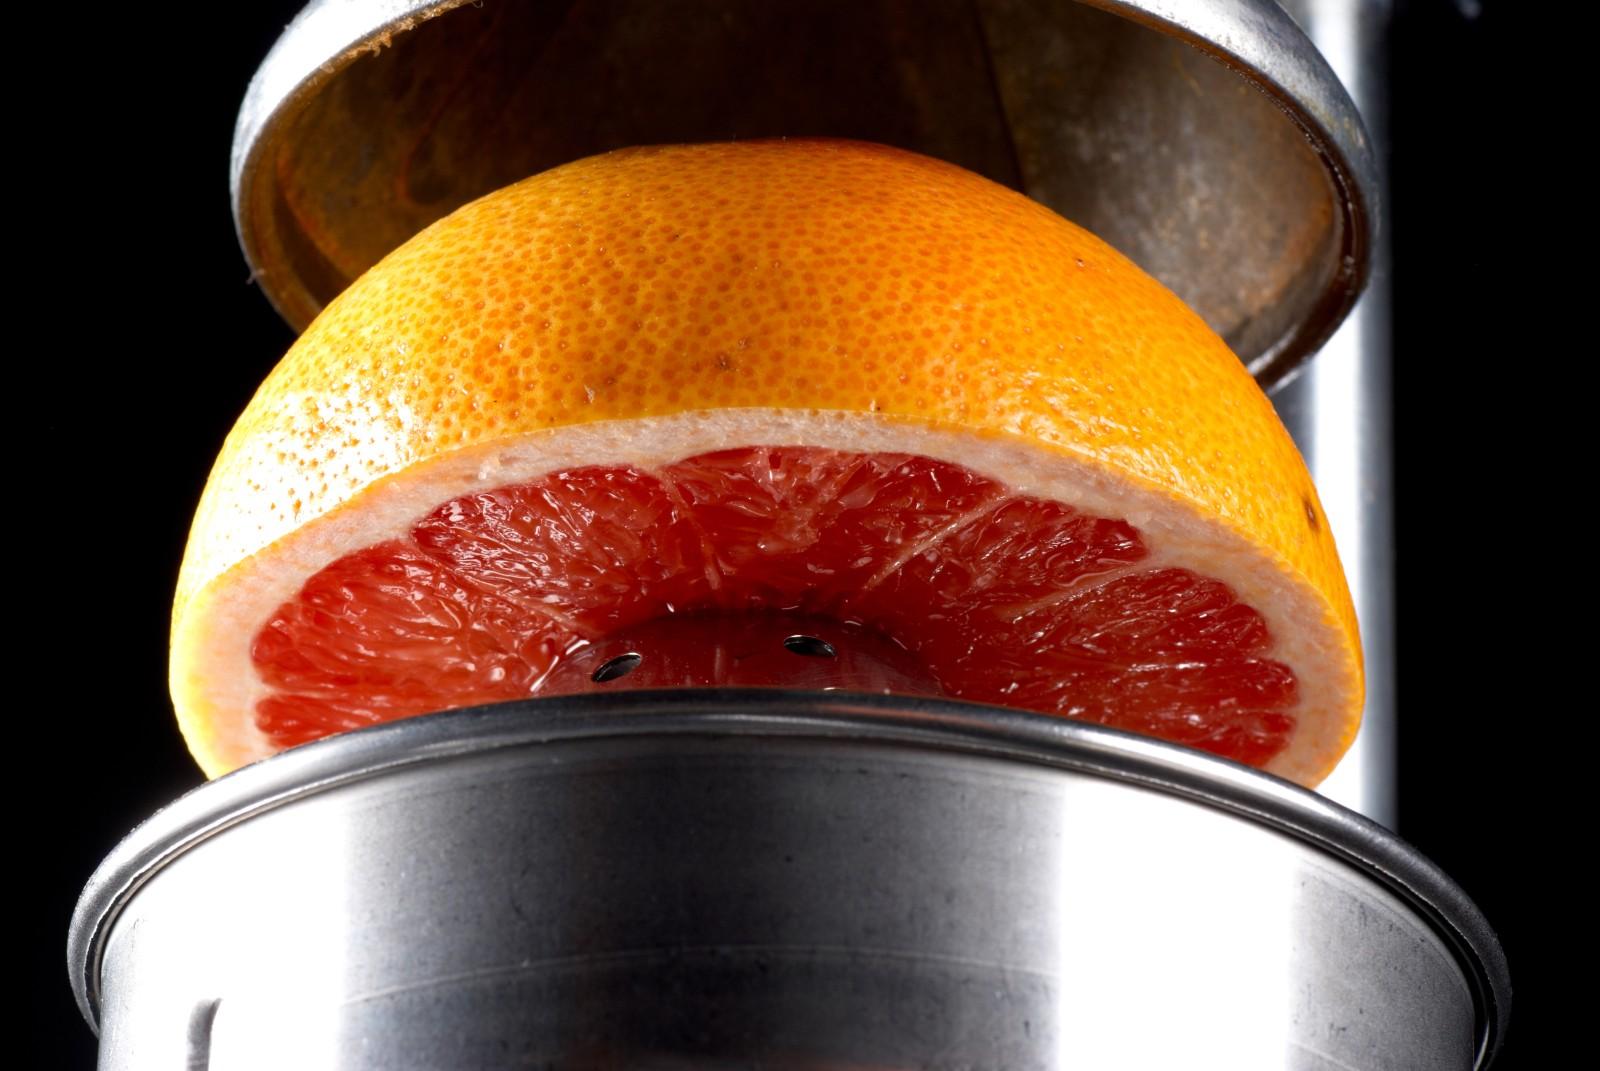 die schlank frucht grapefruit gesundes obst codecheck info. Black Bedroom Furniture Sets. Home Design Ideas